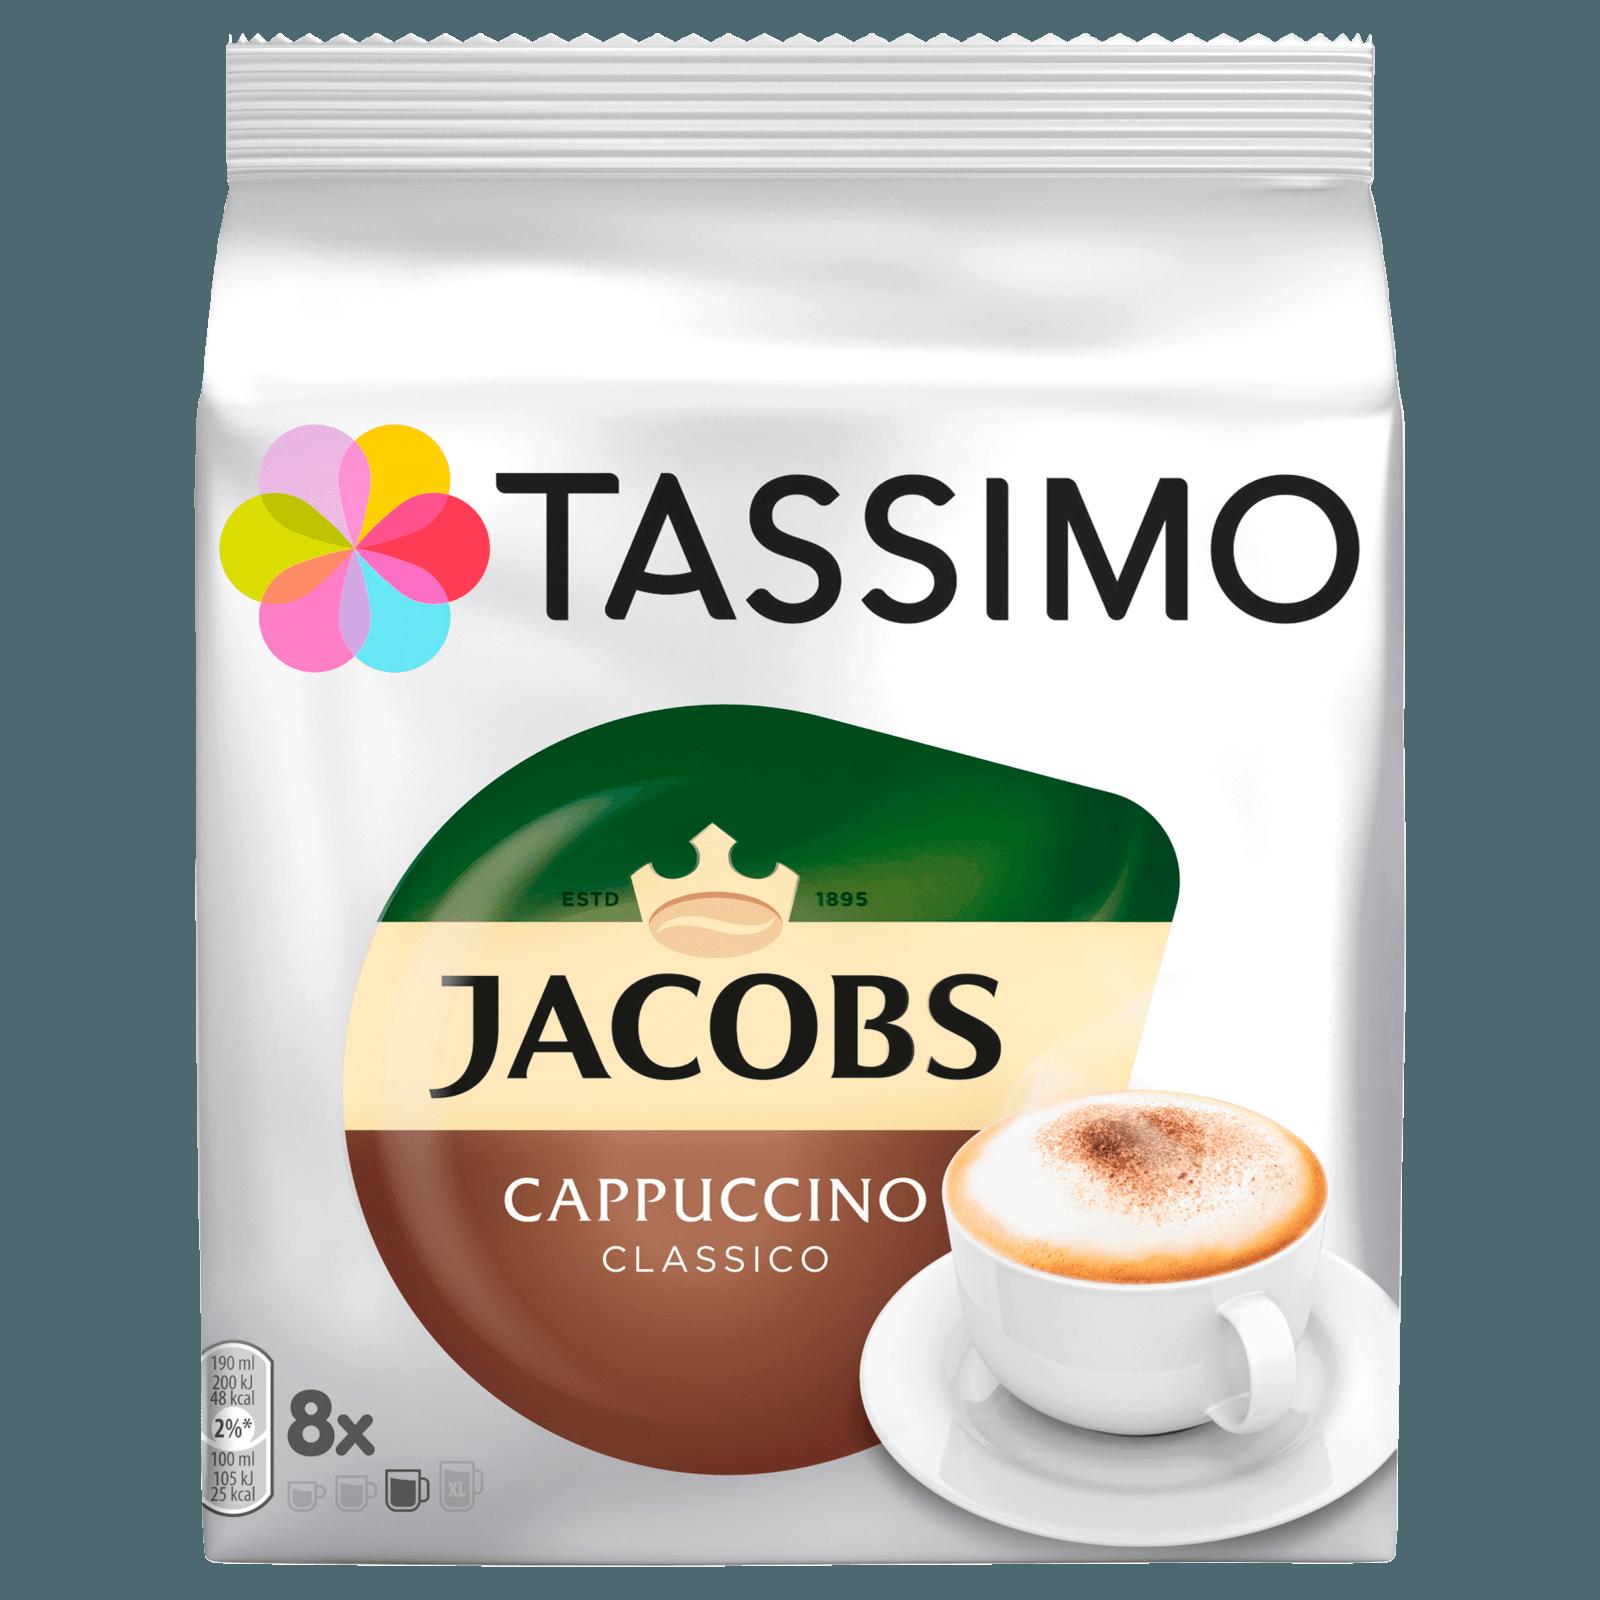 Tassimo Kapseln Jacobs Cappuccino Classico 8 Kaffeekapseln